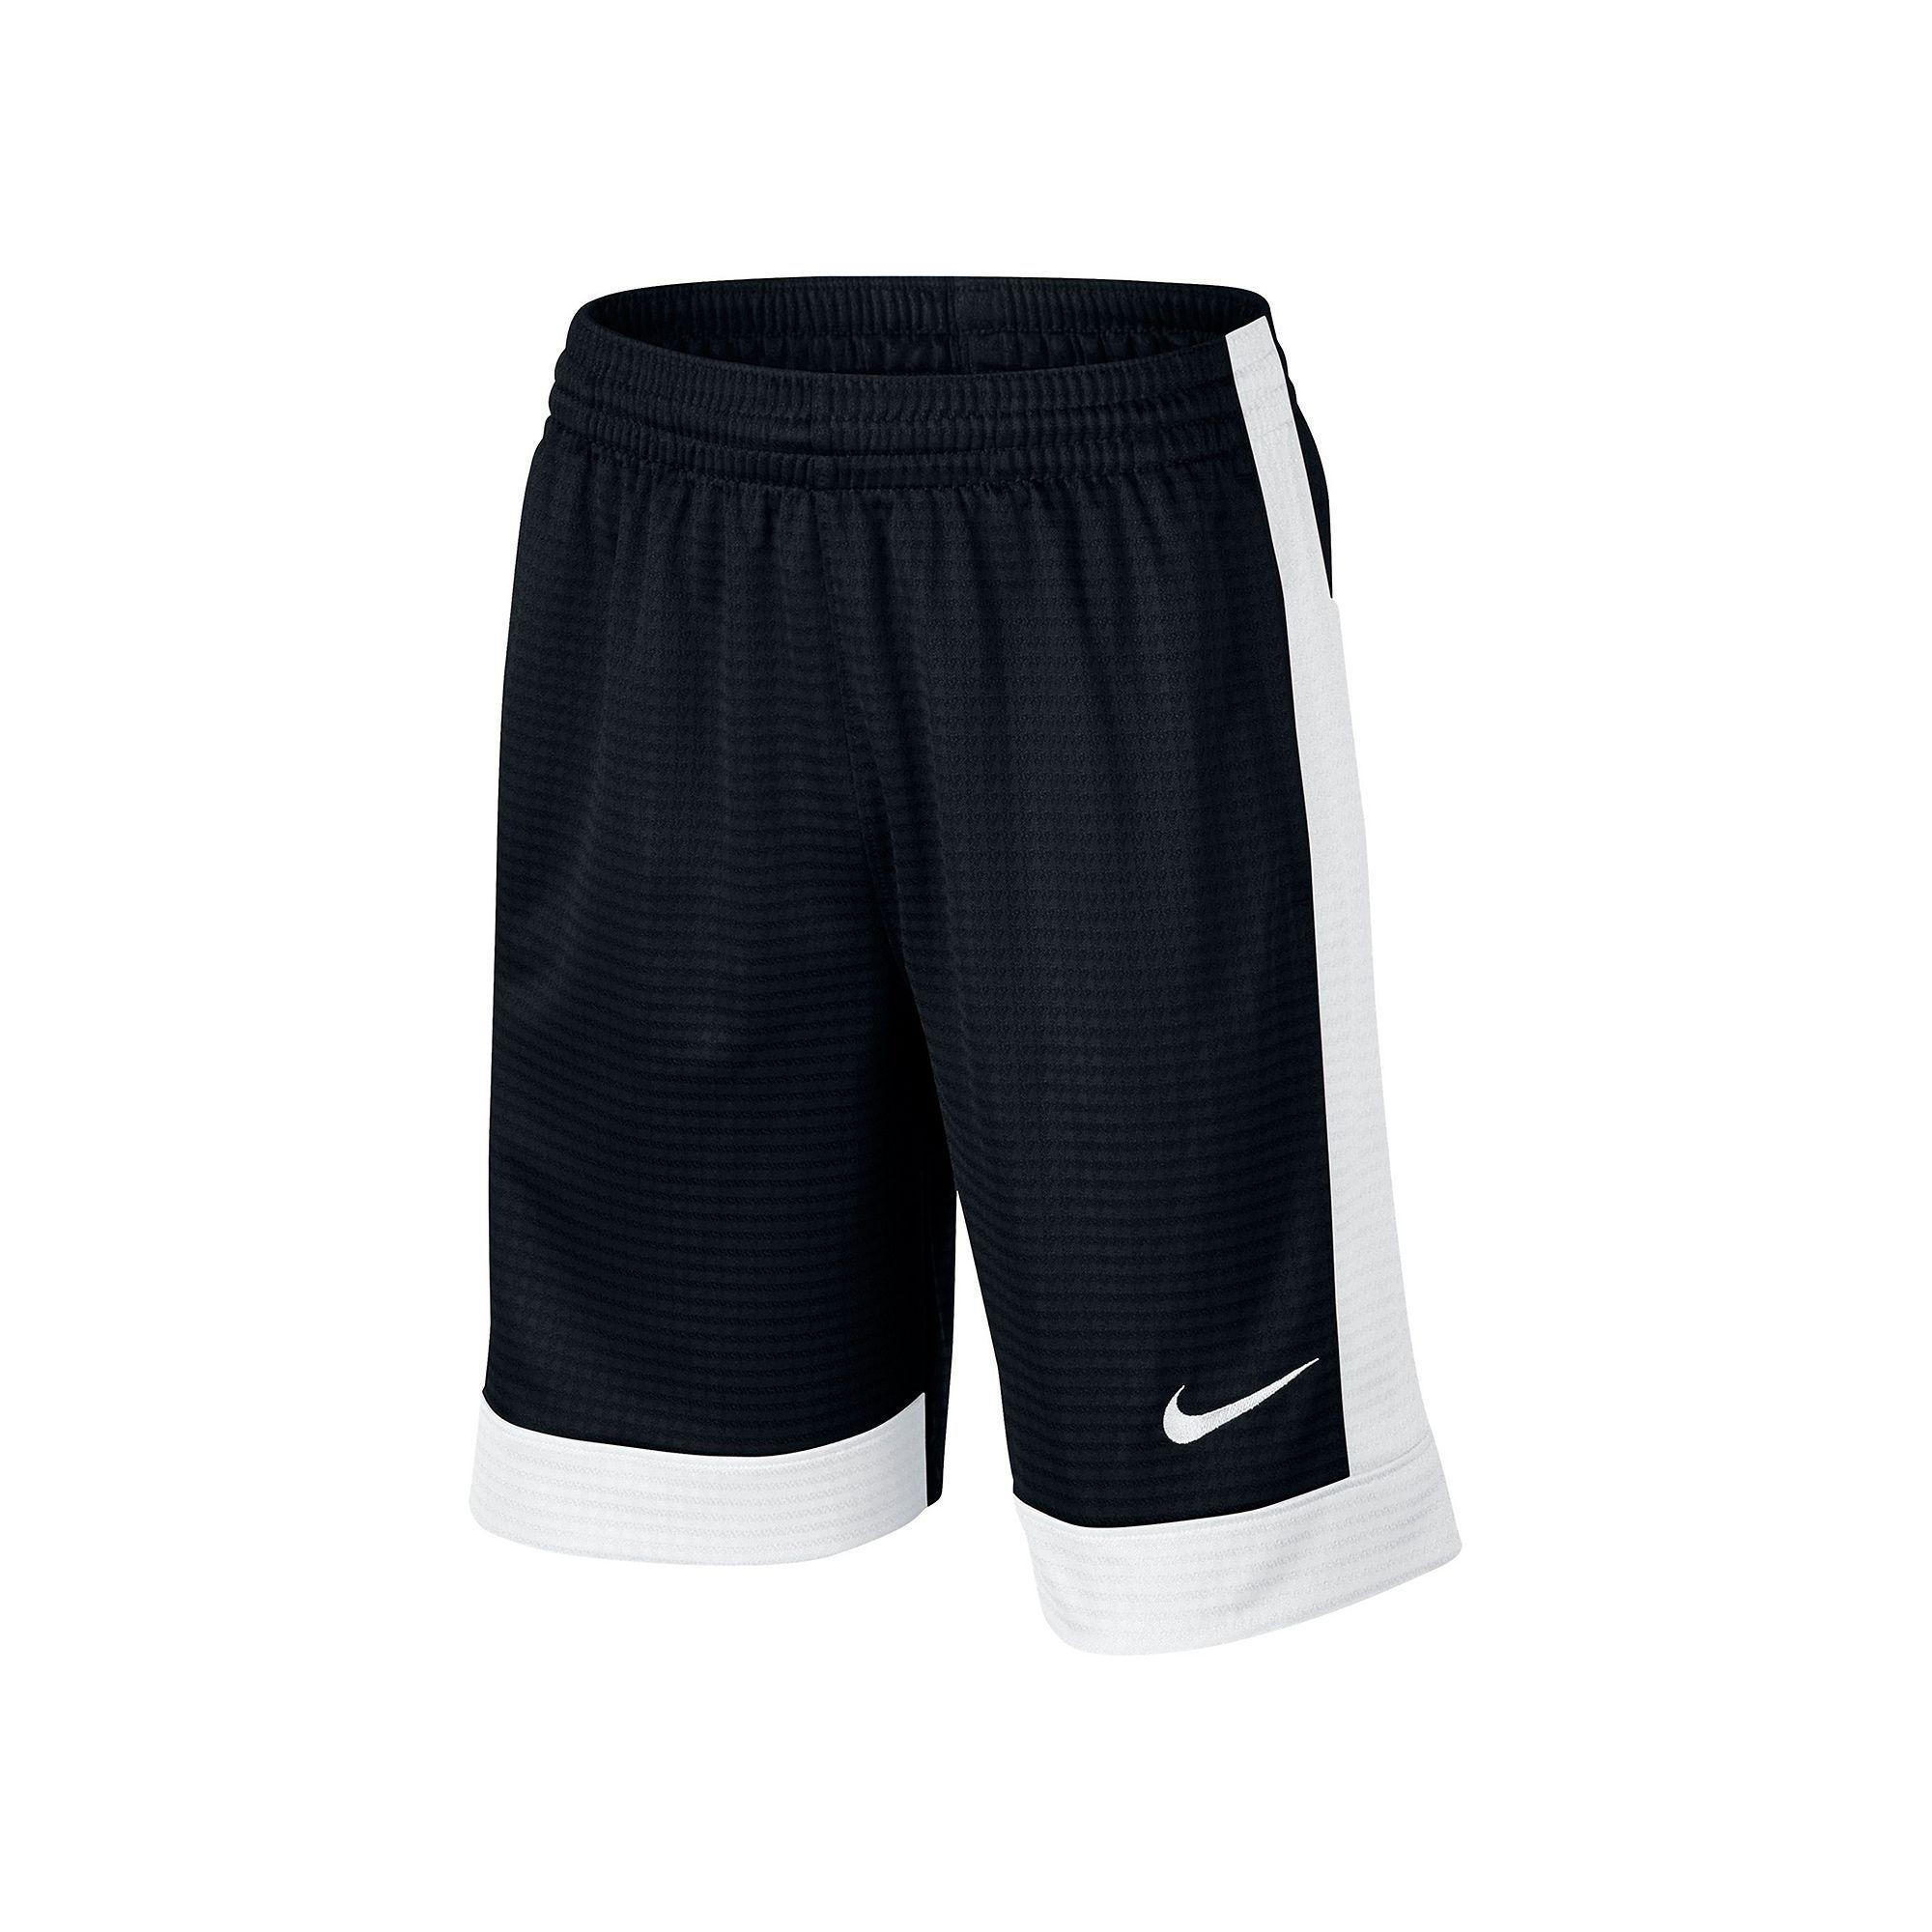 a7b11c09d22b0 Boys 8-20 Nike Assist Shorts | Products | Boys nike shorts, Boys ...